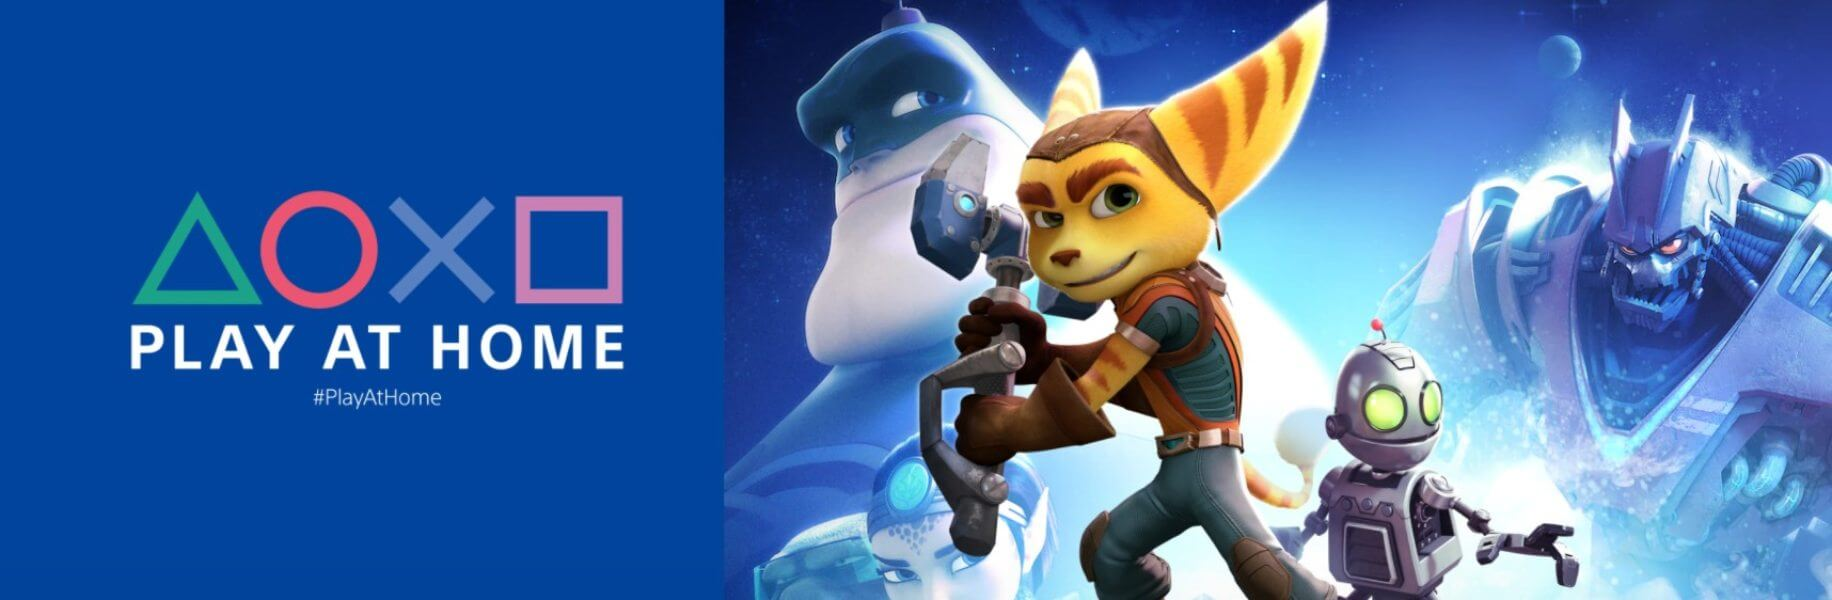 Ratchet and Clank GRATIS para PS4 y PS5 Vuelve el Play At Home